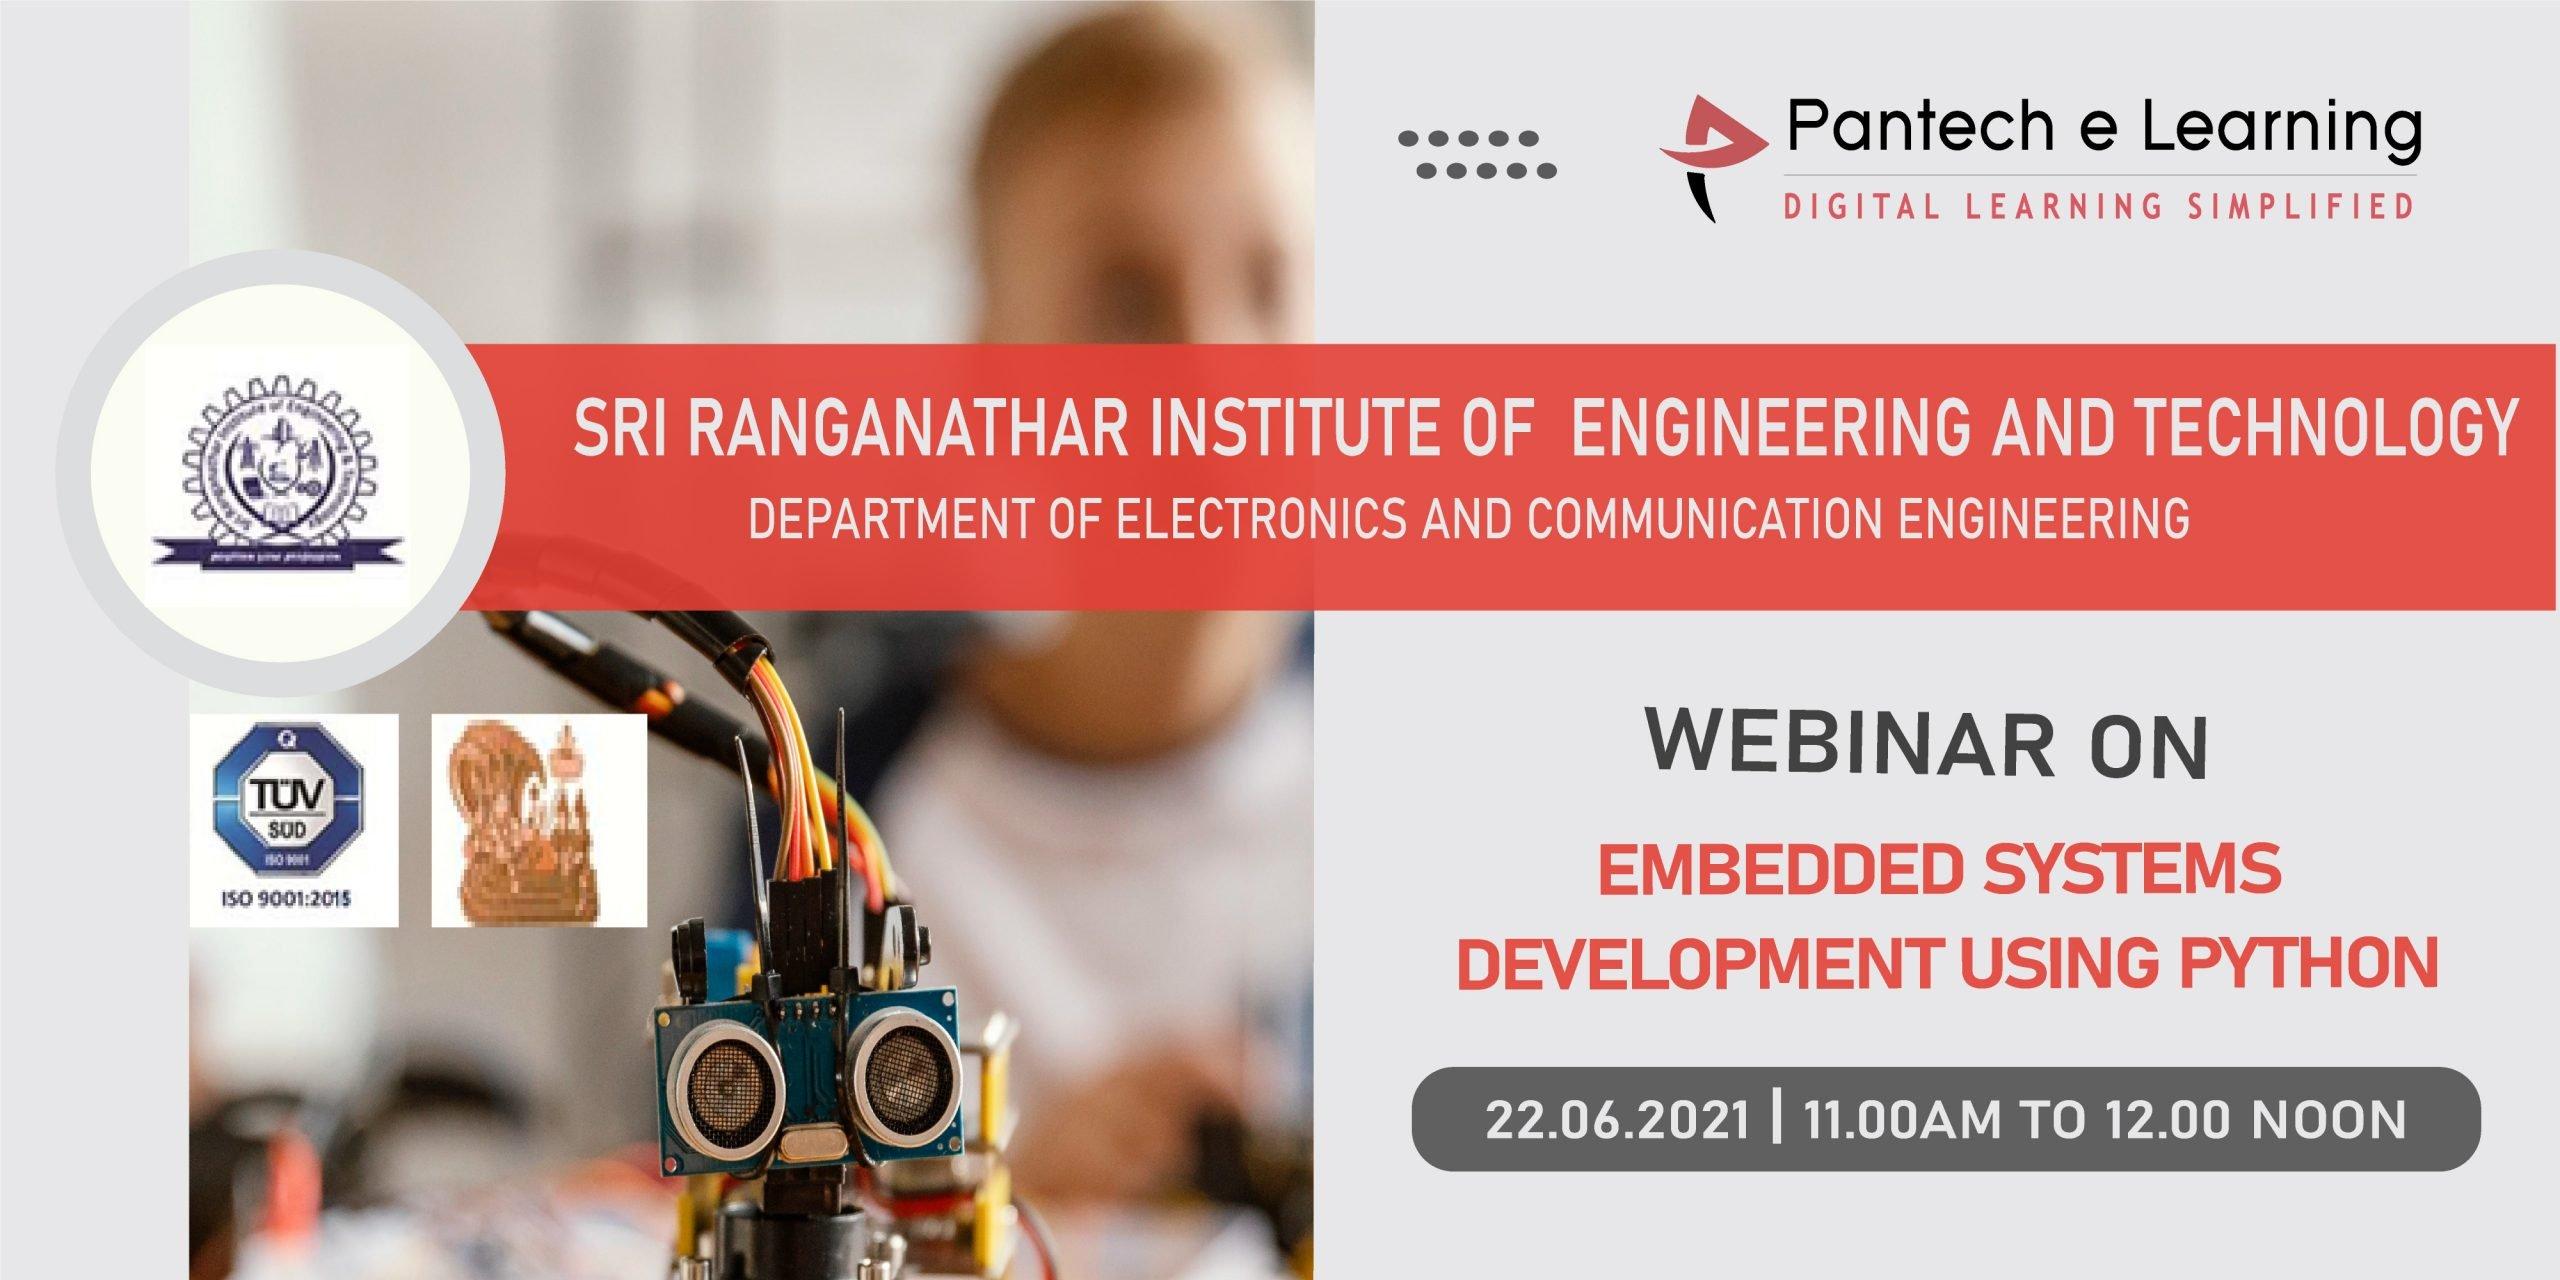 Embedded system developement using Python SRIET Pantech eLearning